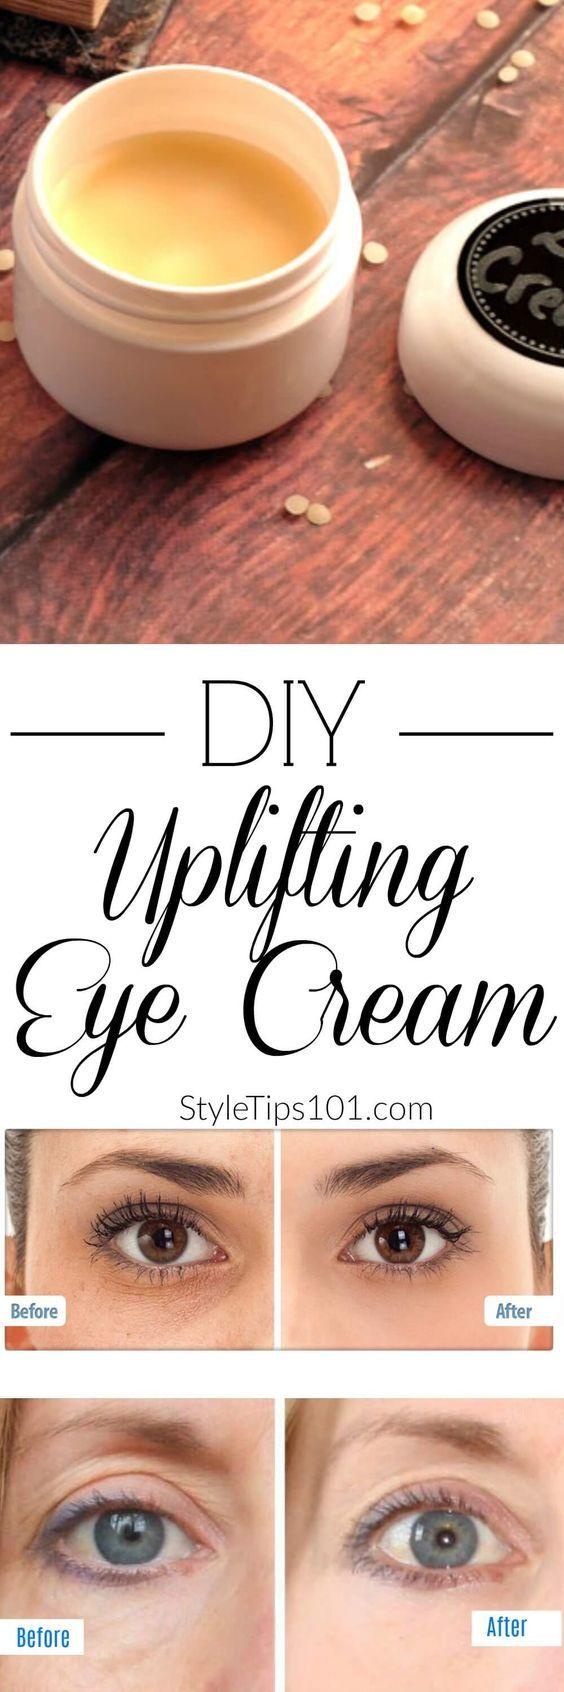 Best 25+ Puffy eye remedies ideas on Pinterest